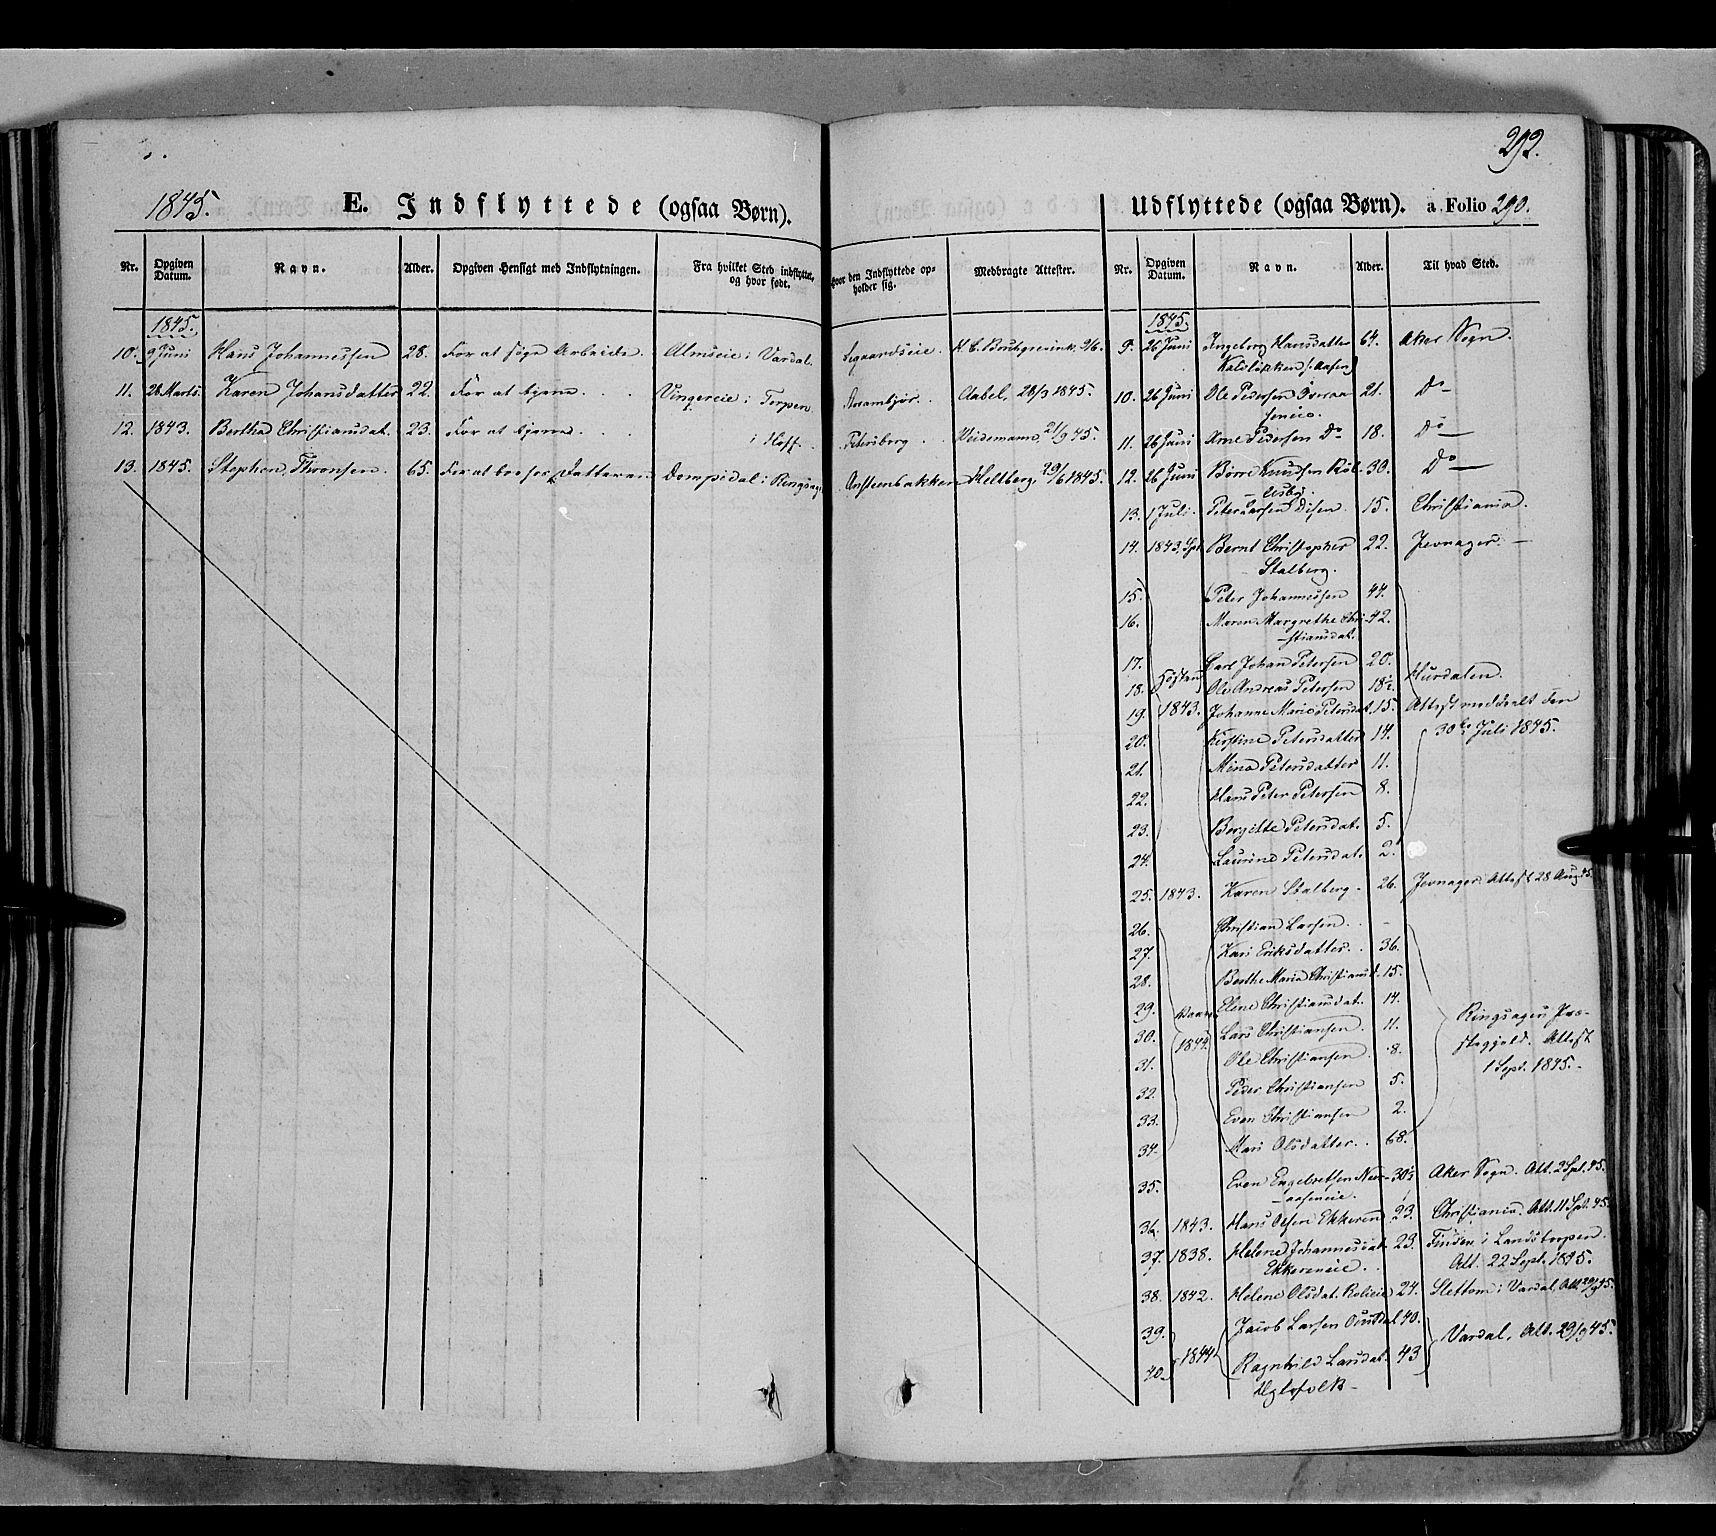 SAH, Biri prestekontor, Ministerialbok nr. 5, 1843-1854, s. 292